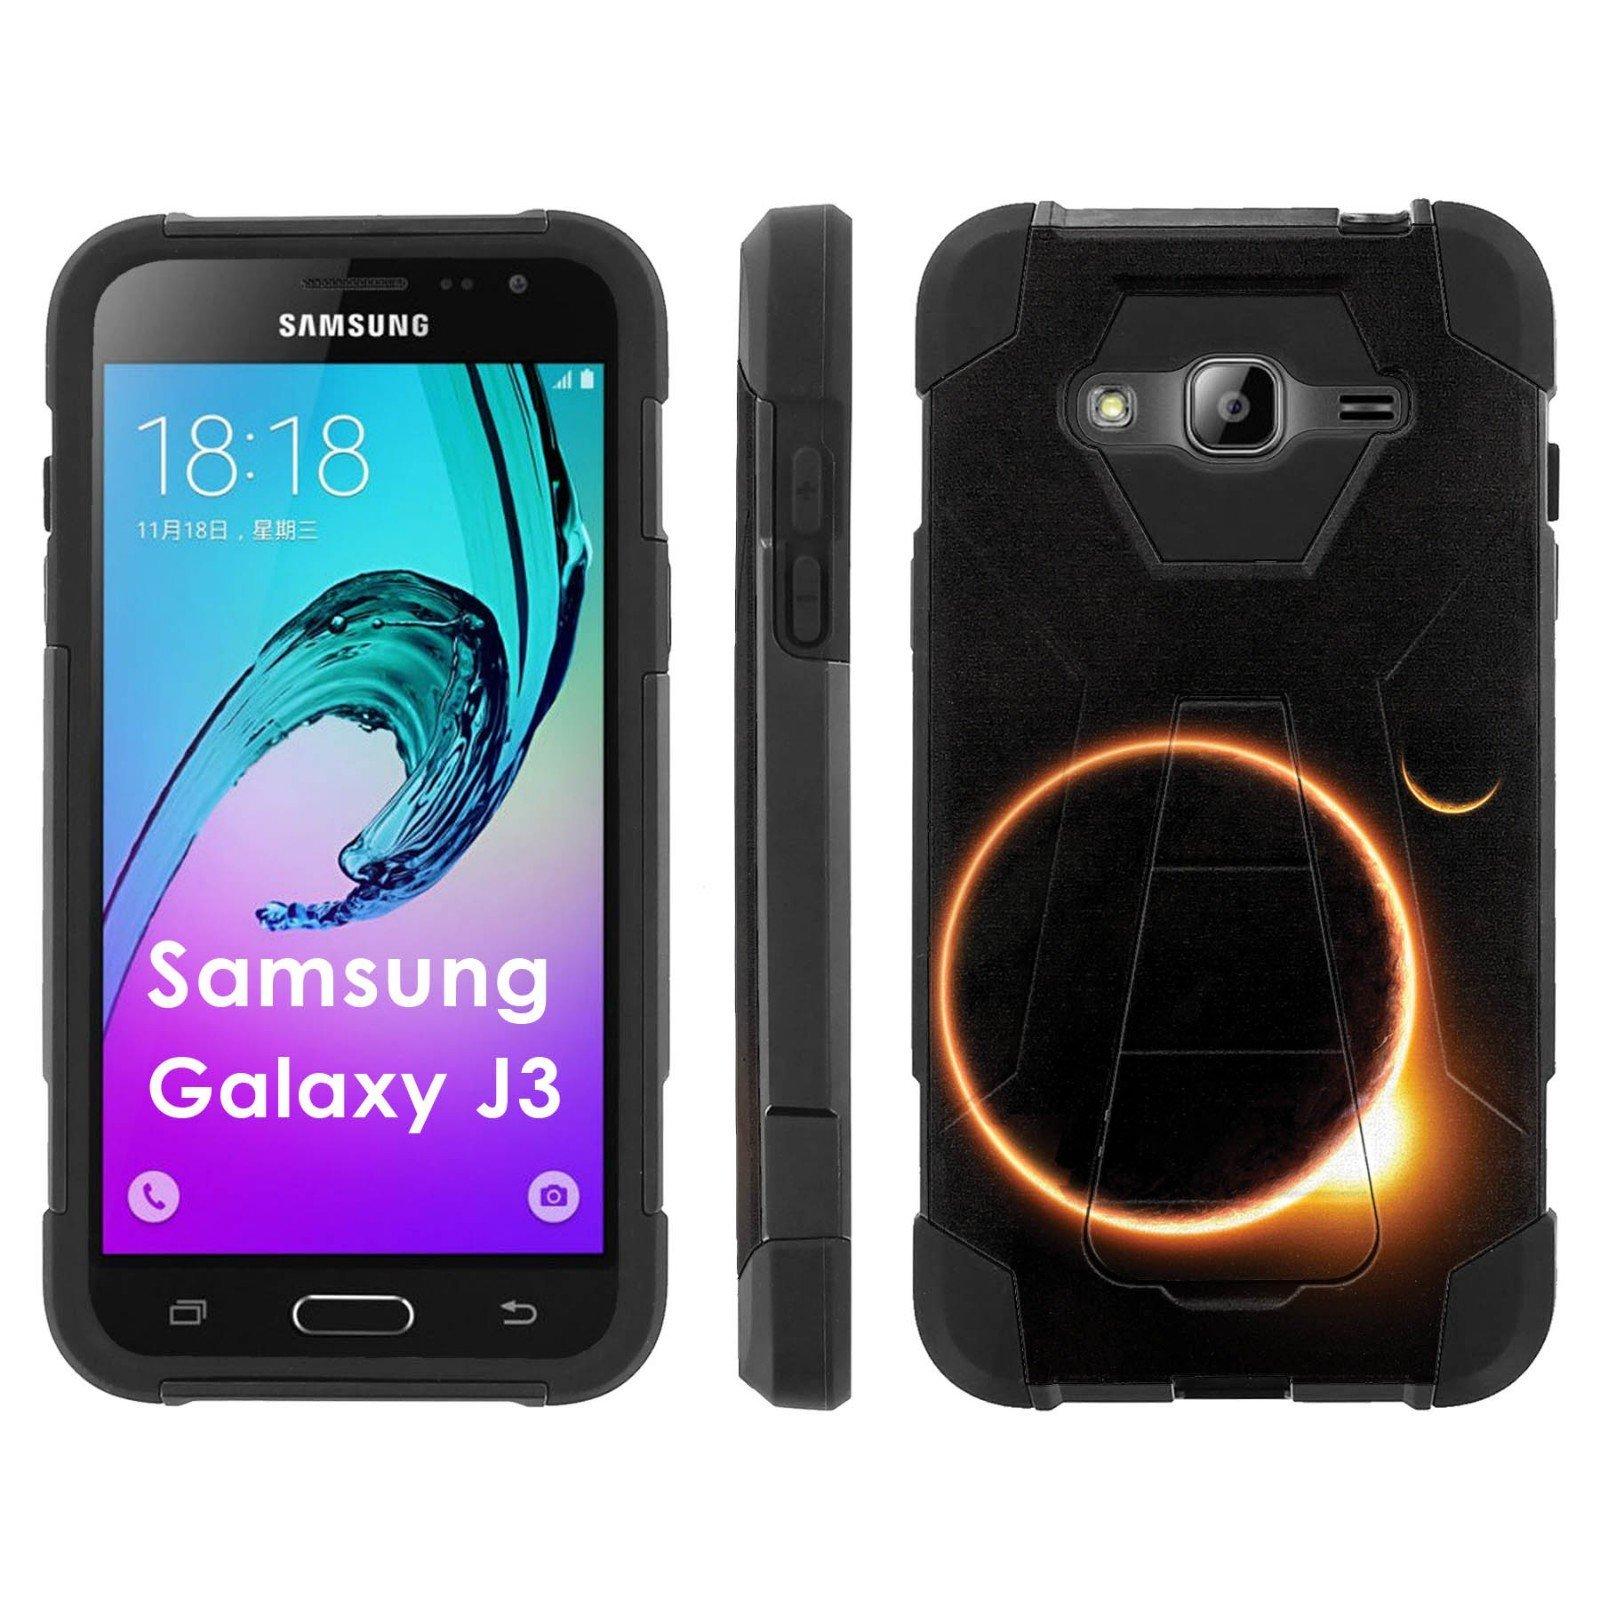 Samsung Galaxy J3 Phone Cover, Solar Eclipse - Black Hexo Hybrid Armor Phone Case for Samsung Galaxy J3